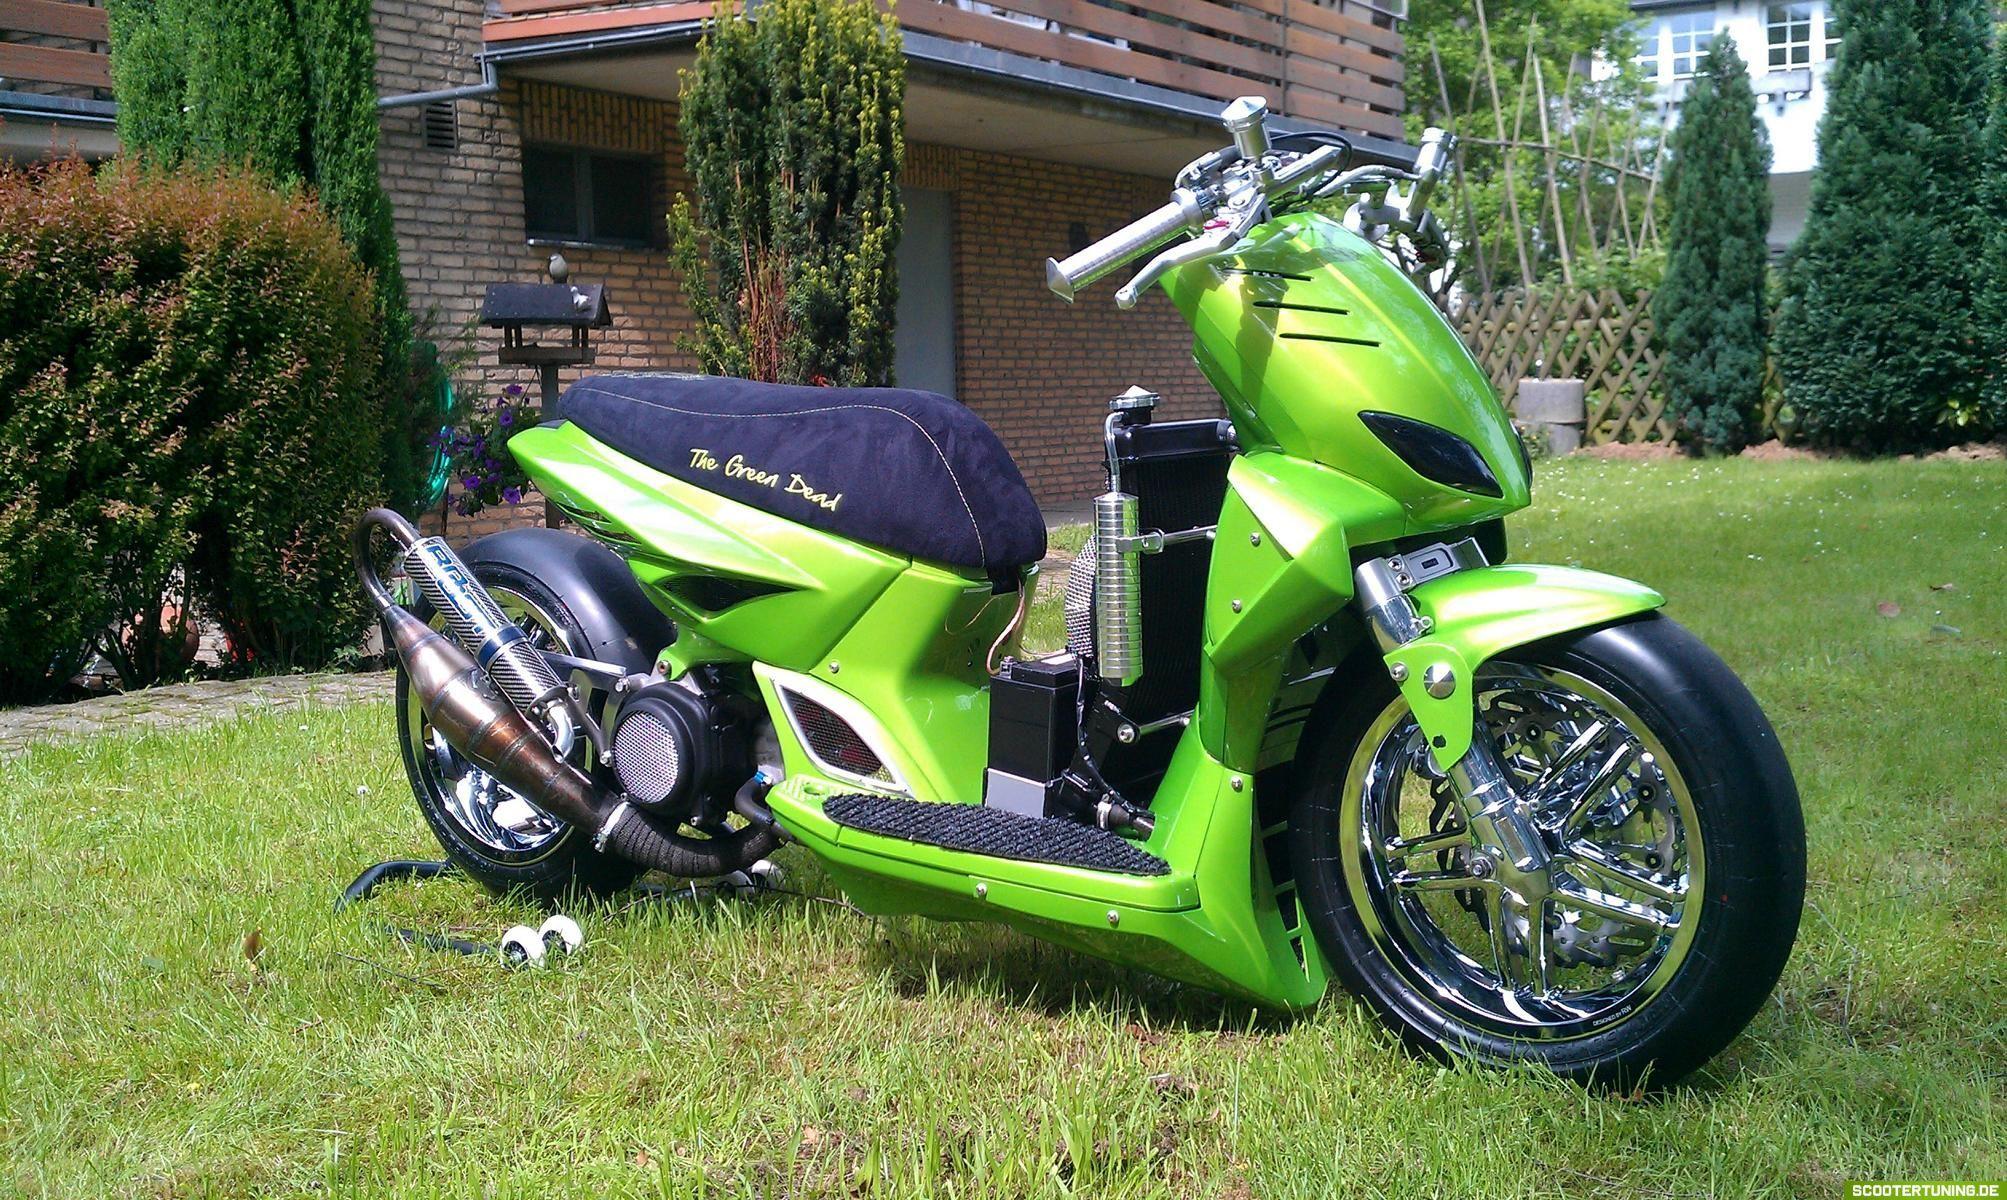 mbk stunt h2o stuntro yamaha scooter scooter custom motorcycle. Black Bedroom Furniture Sets. Home Design Ideas